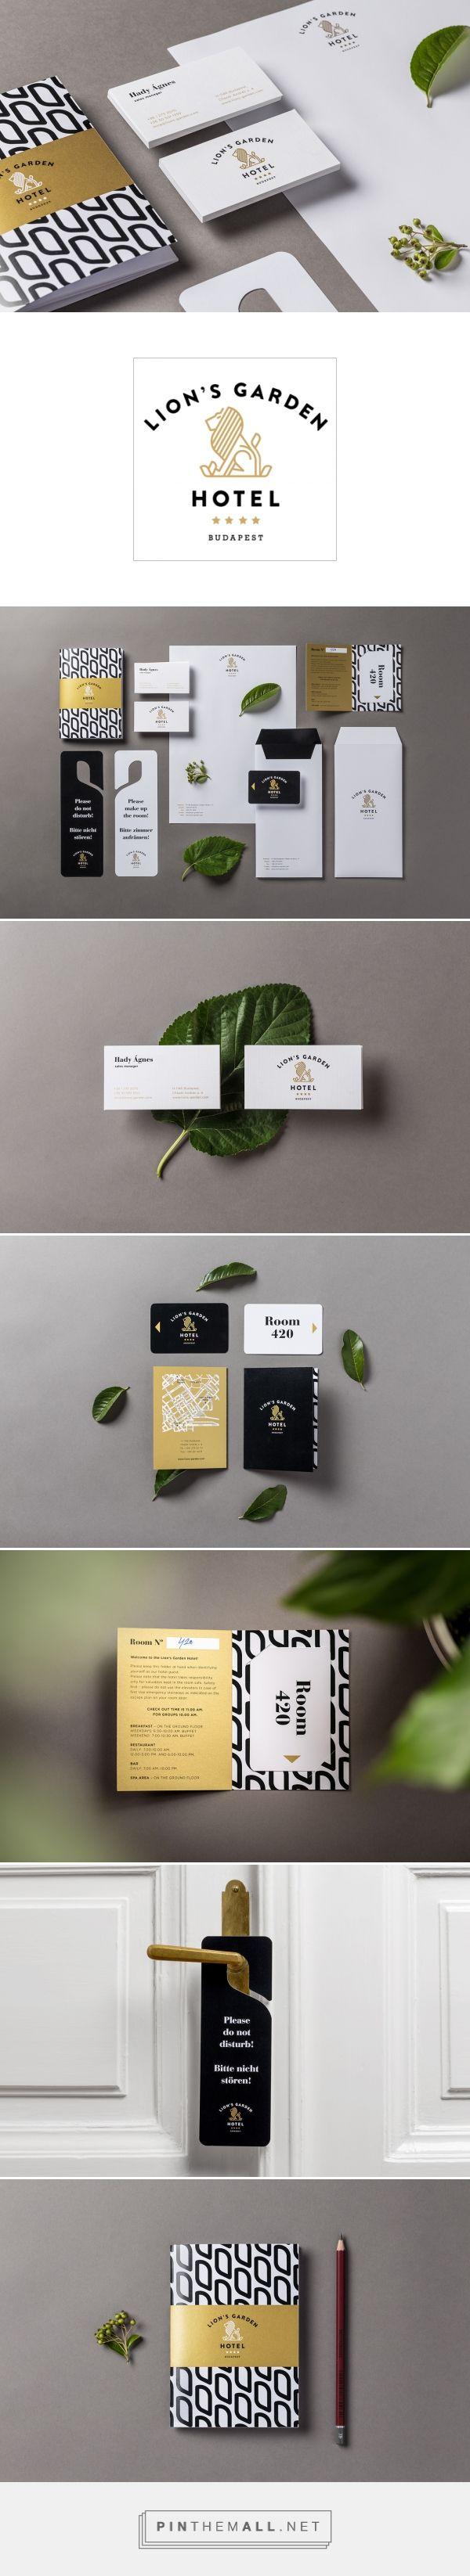 Lion's Garden Hotel on Behance  | Fivestar Branding – Design and Branding Agency & Inspiration Gallery